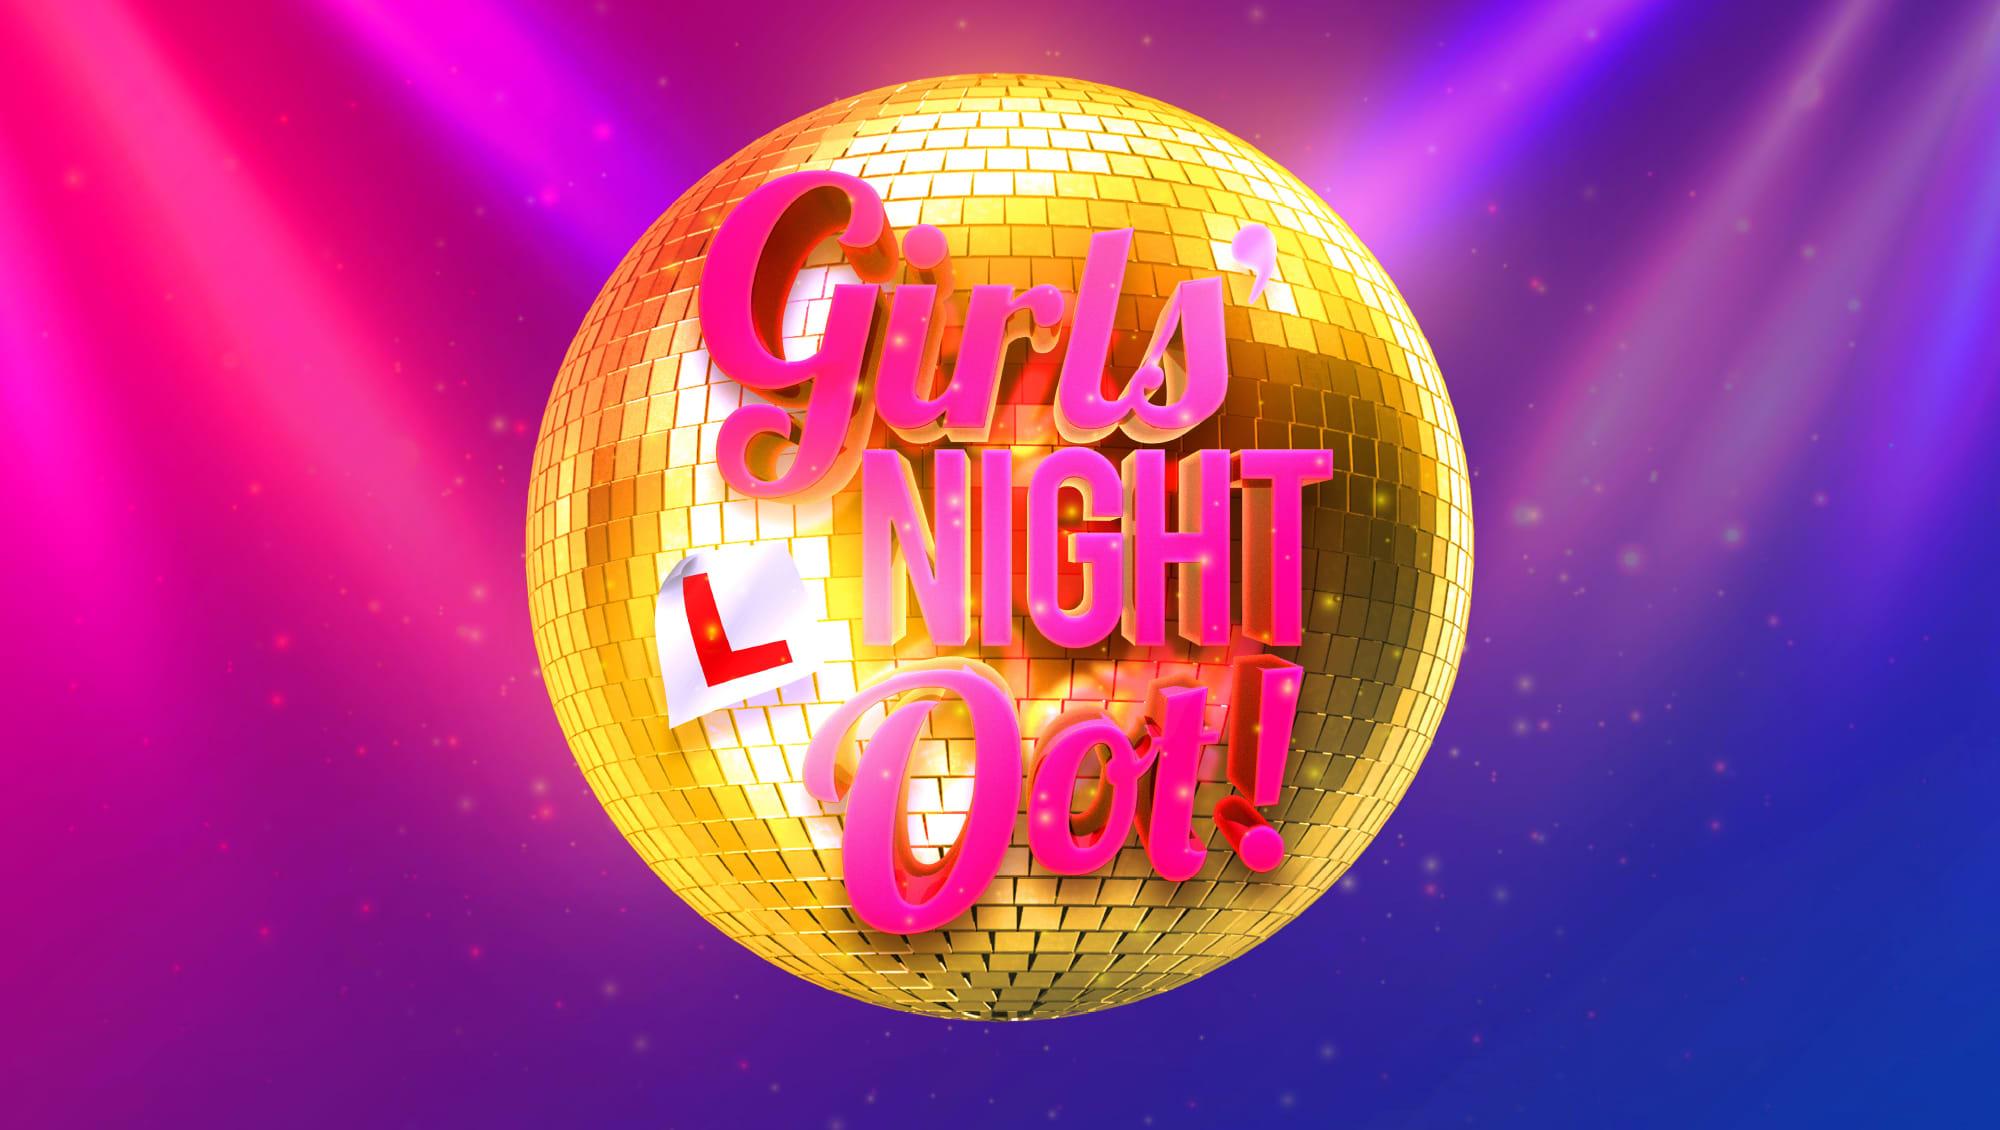 Girls Night Oot title